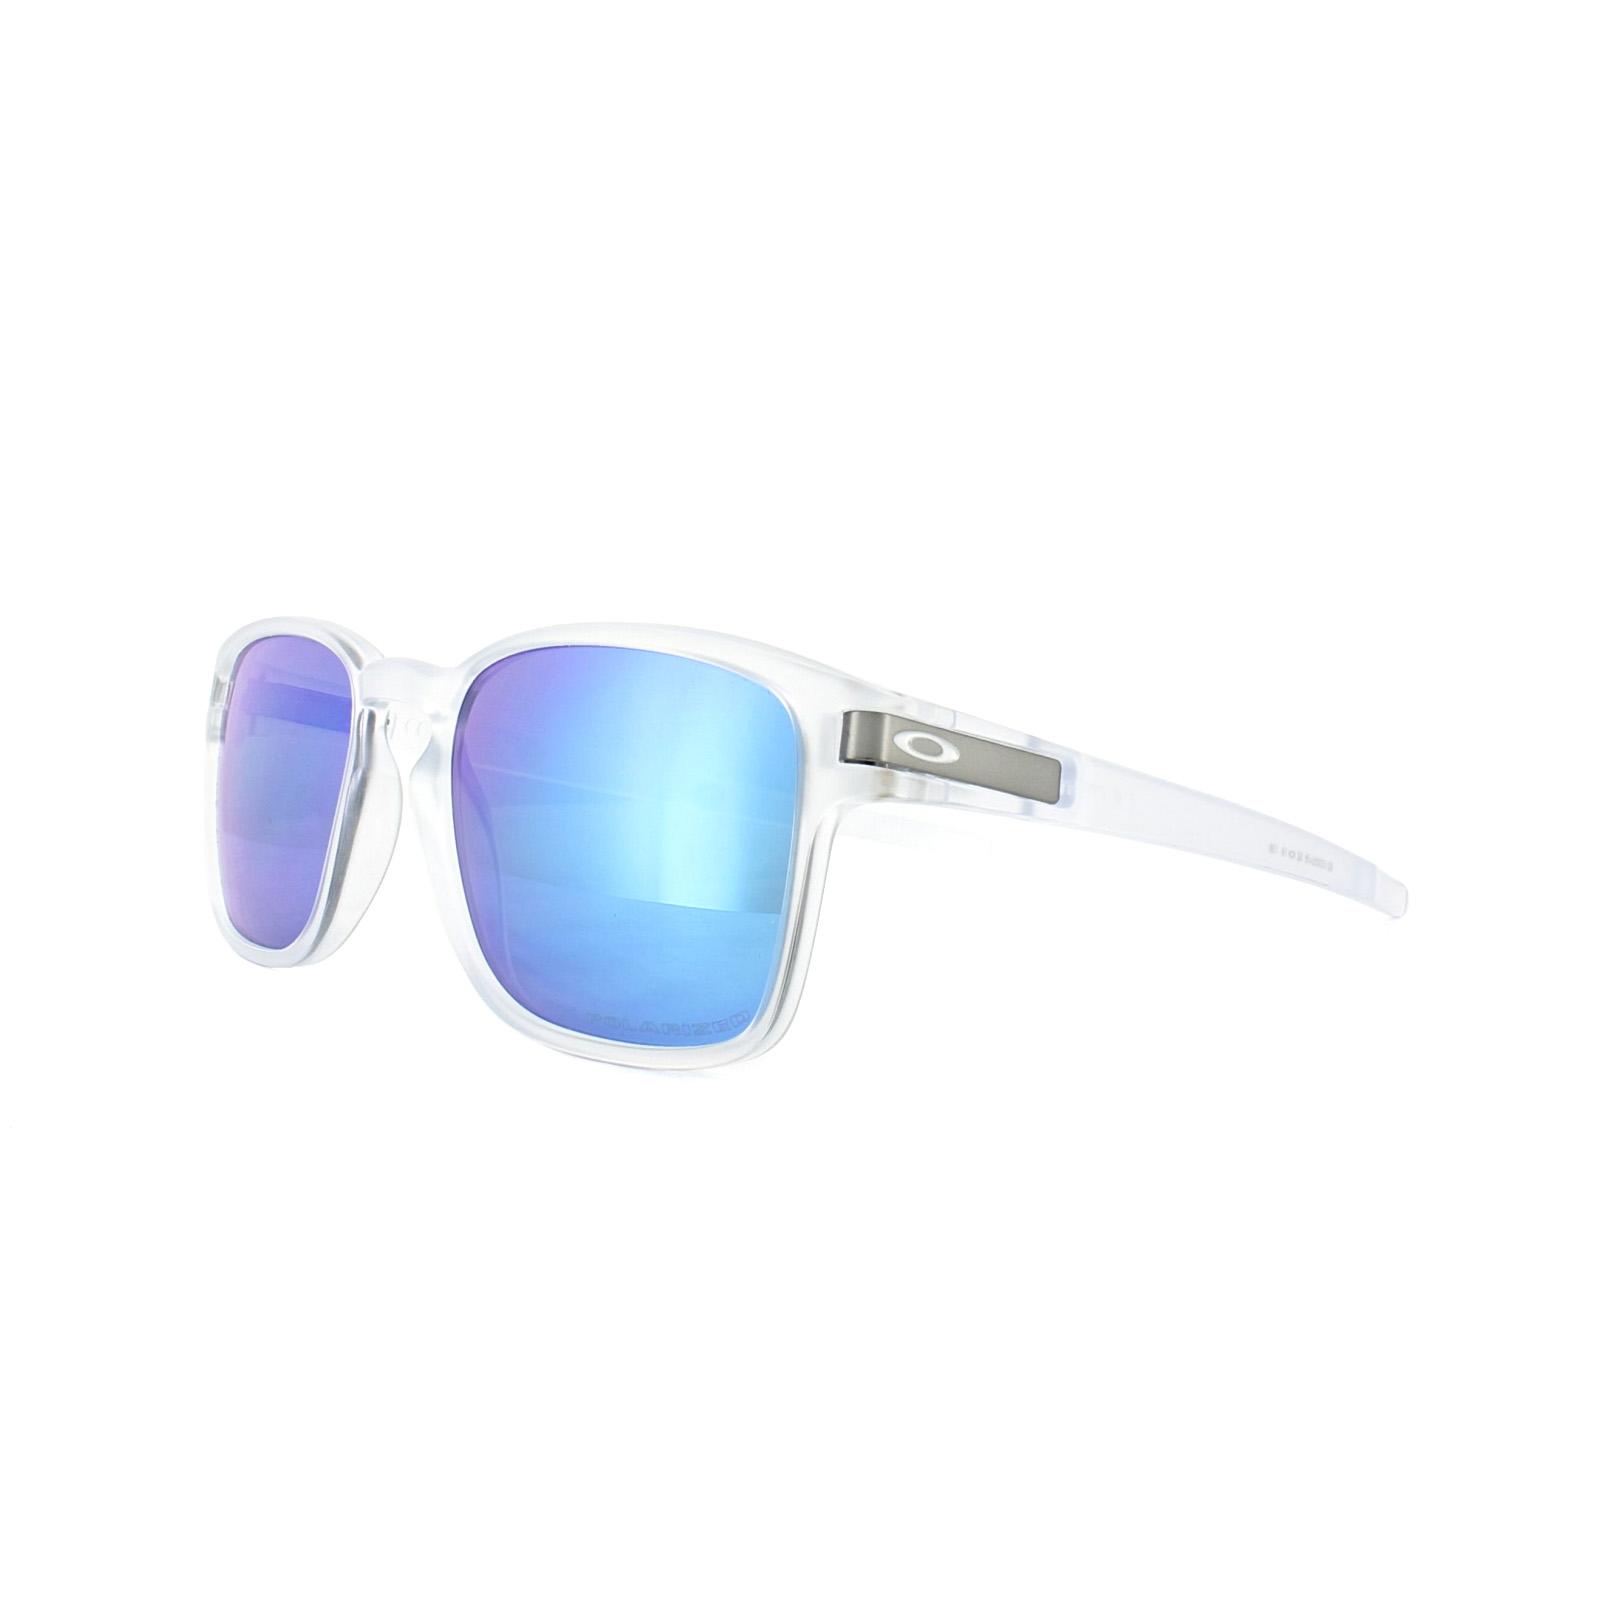 Oakley Gafas de sol Latch Cuadrado oo9353-06 CLARO ZAFIRO Iridio ...